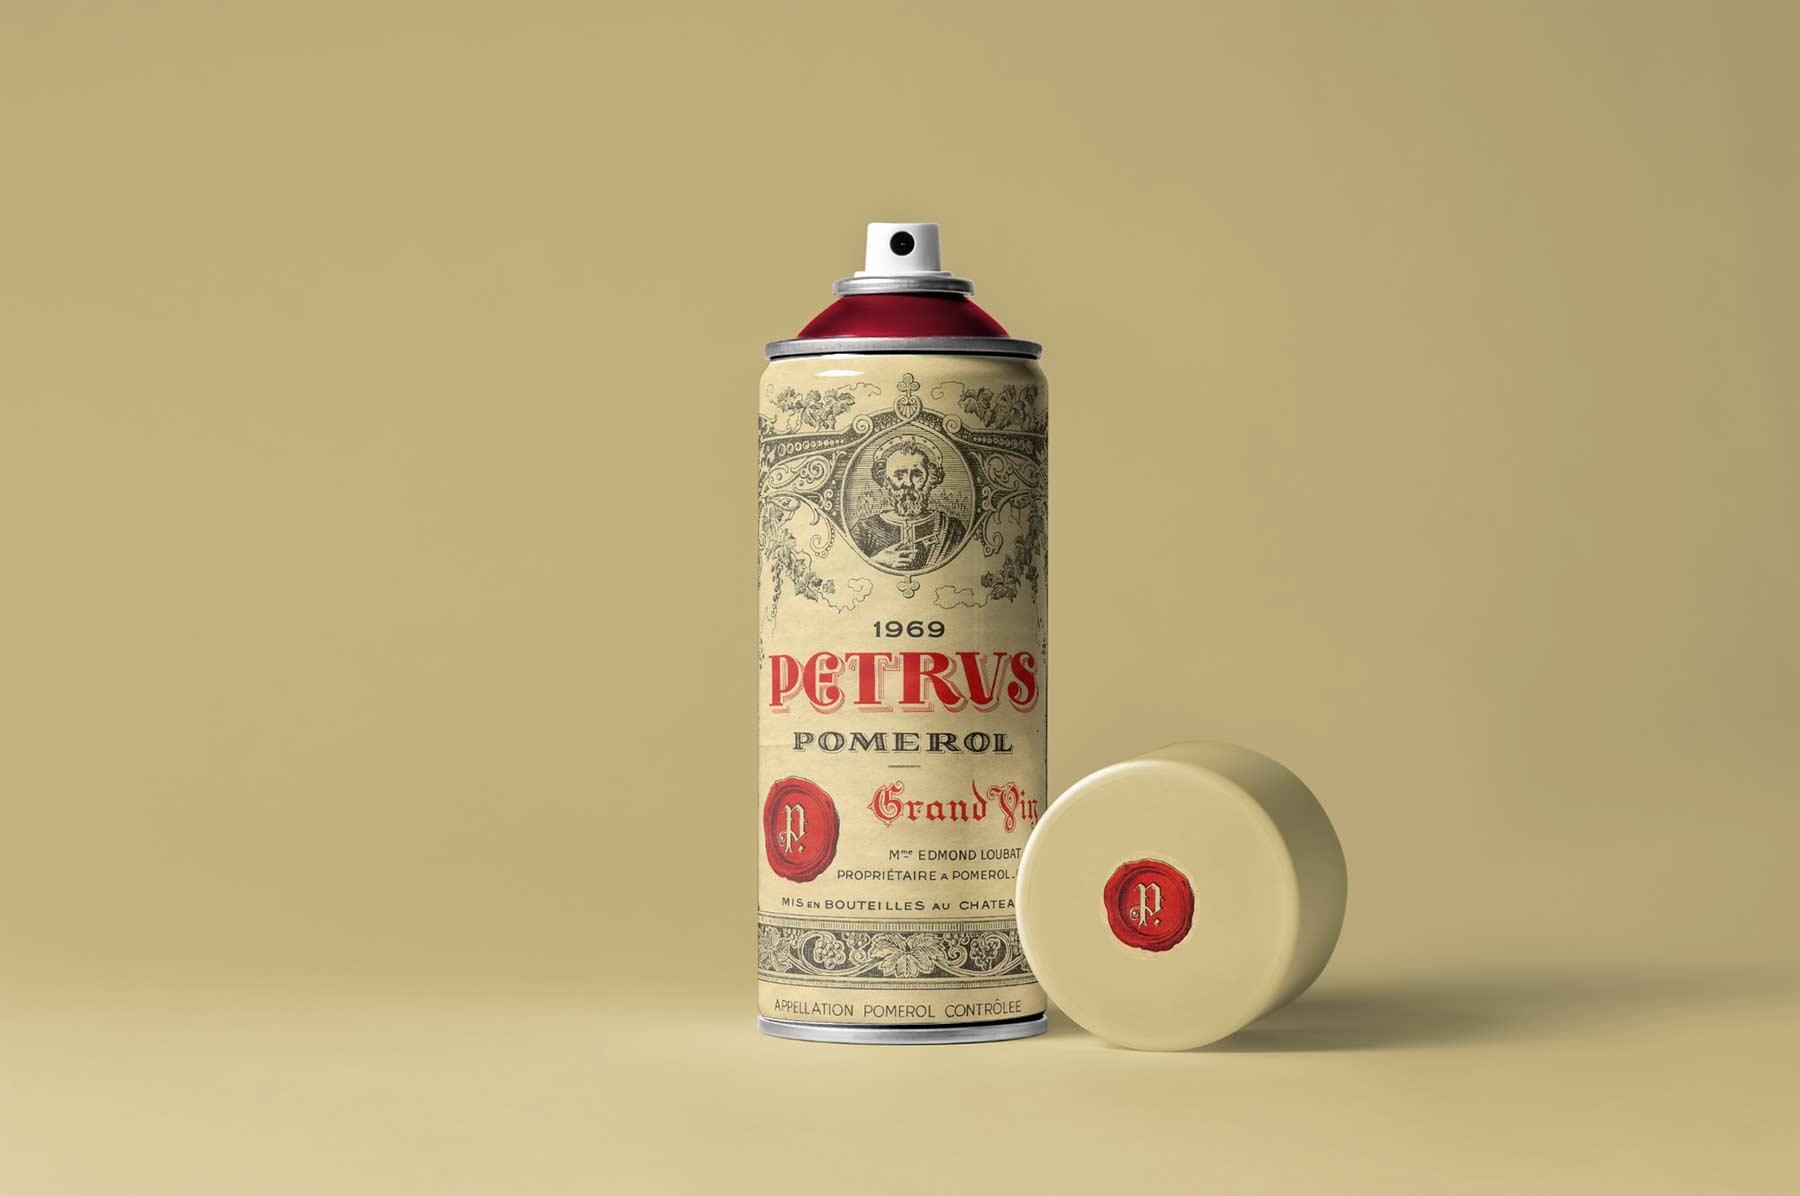 Luxus-Spraydosen Nouveau-Riche-luxus-farbdosen_08